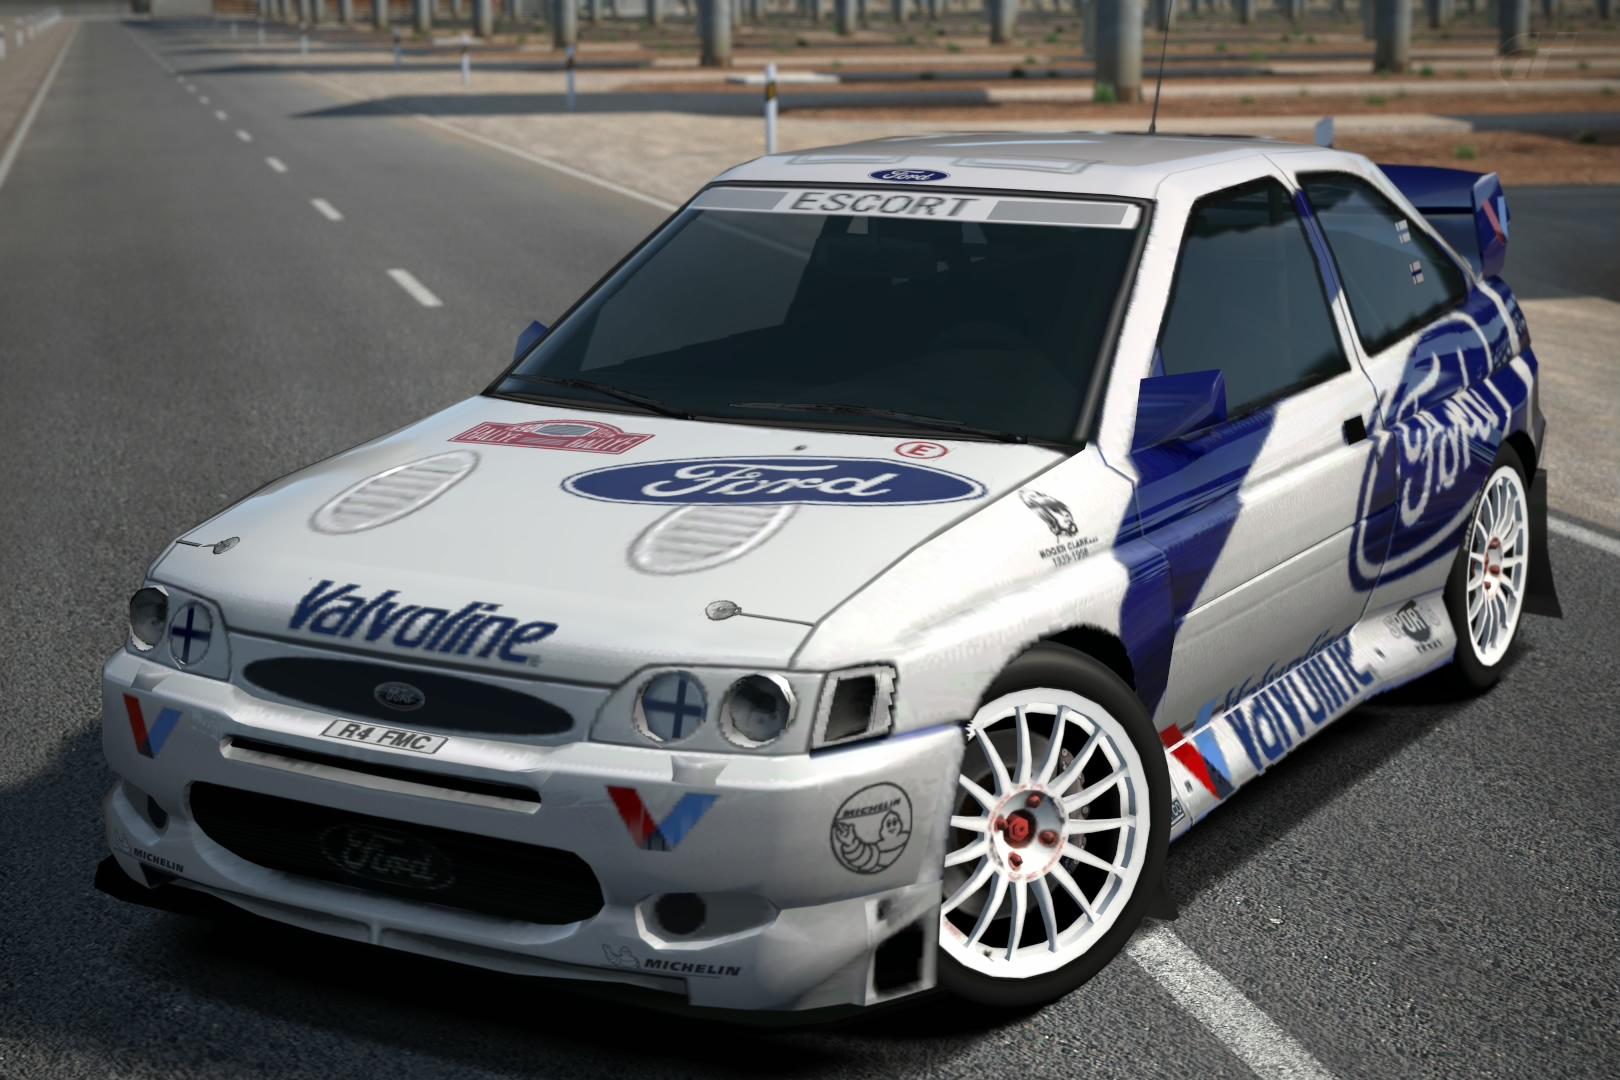 Ford Escort Rally Car u002798 (PS3).jpg & Image - Ford Escort Rally Car u002798 (PS3).jpg | Gran Turismo Wiki ... markmcfarlin.com